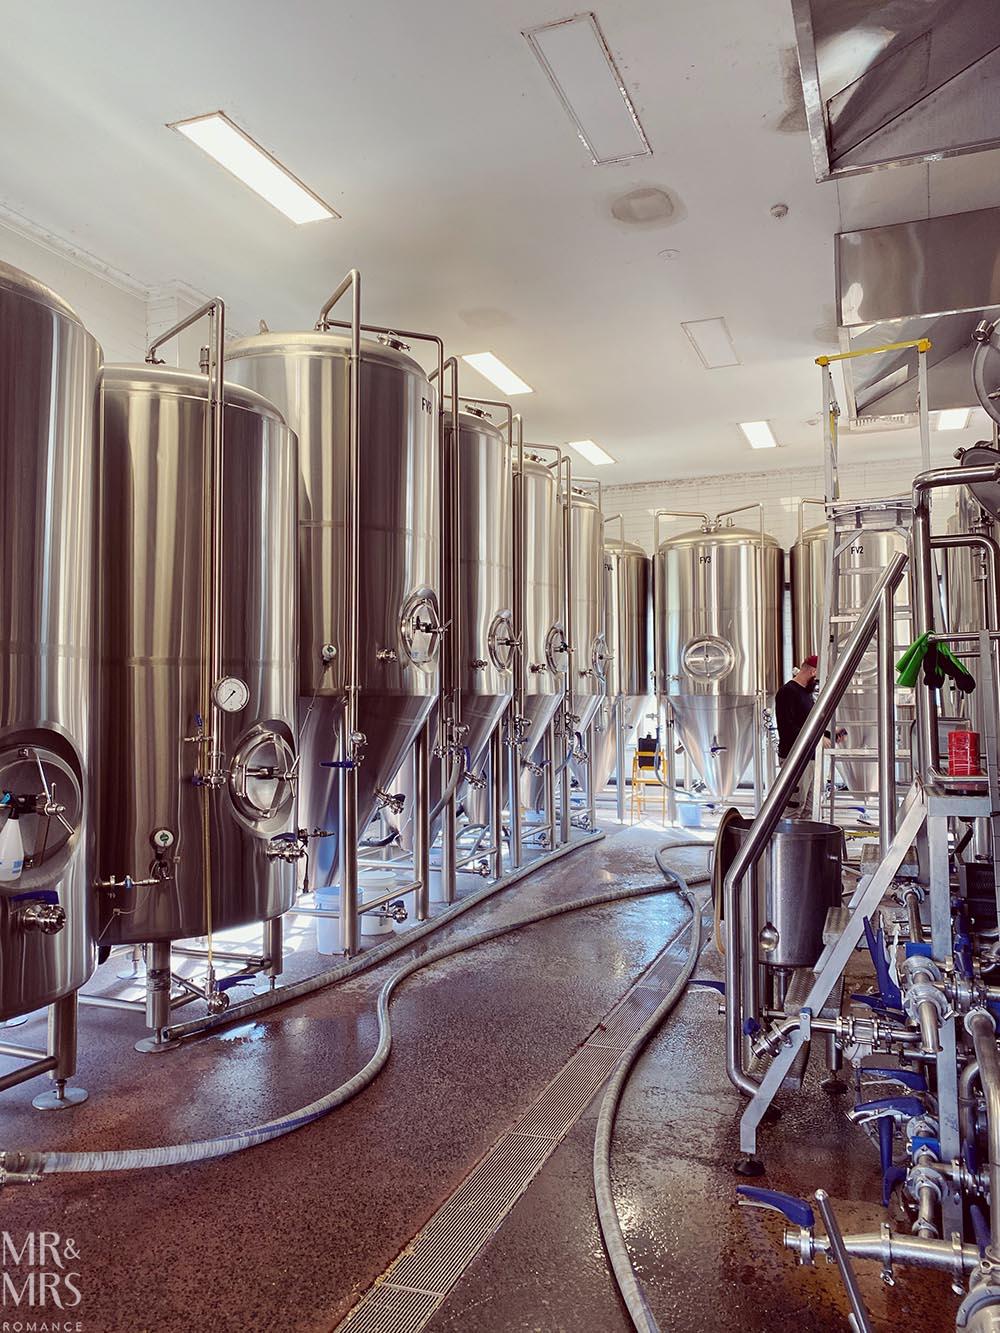 Sydney Brewery tanks